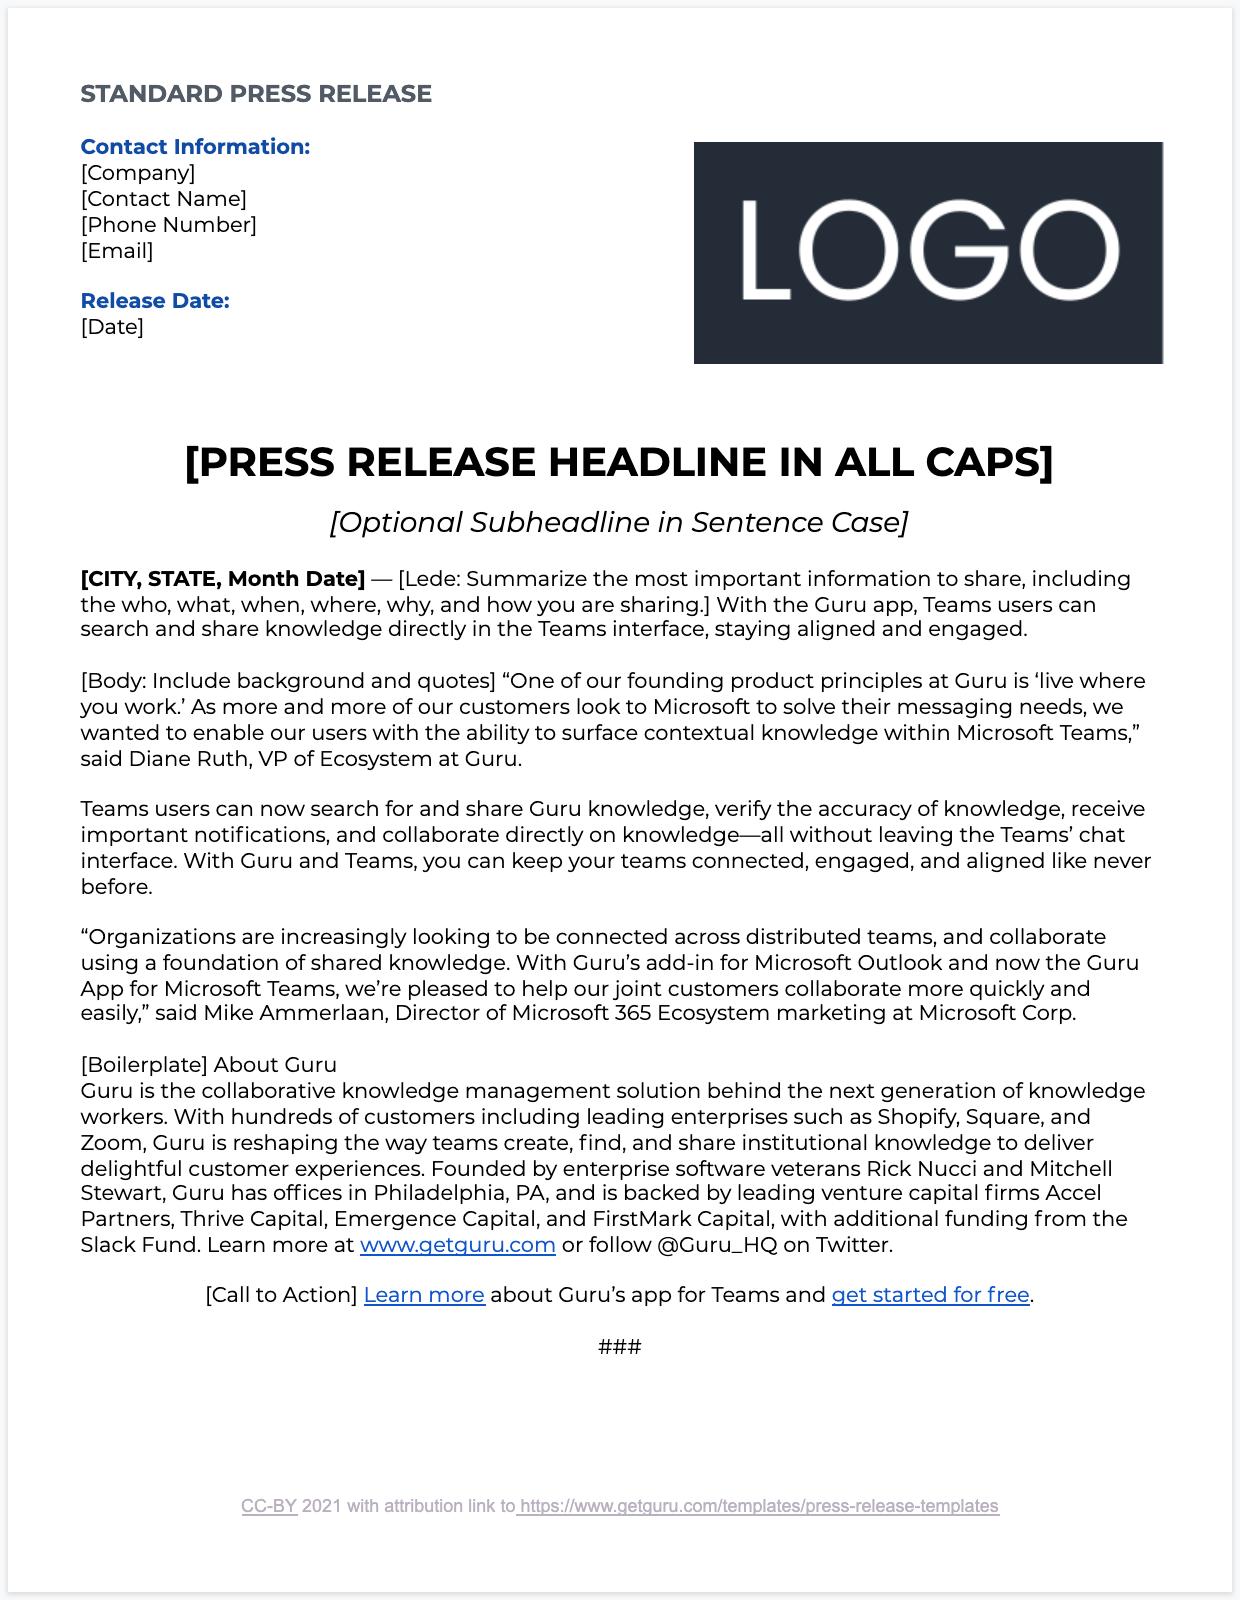 Standard Press Release Template